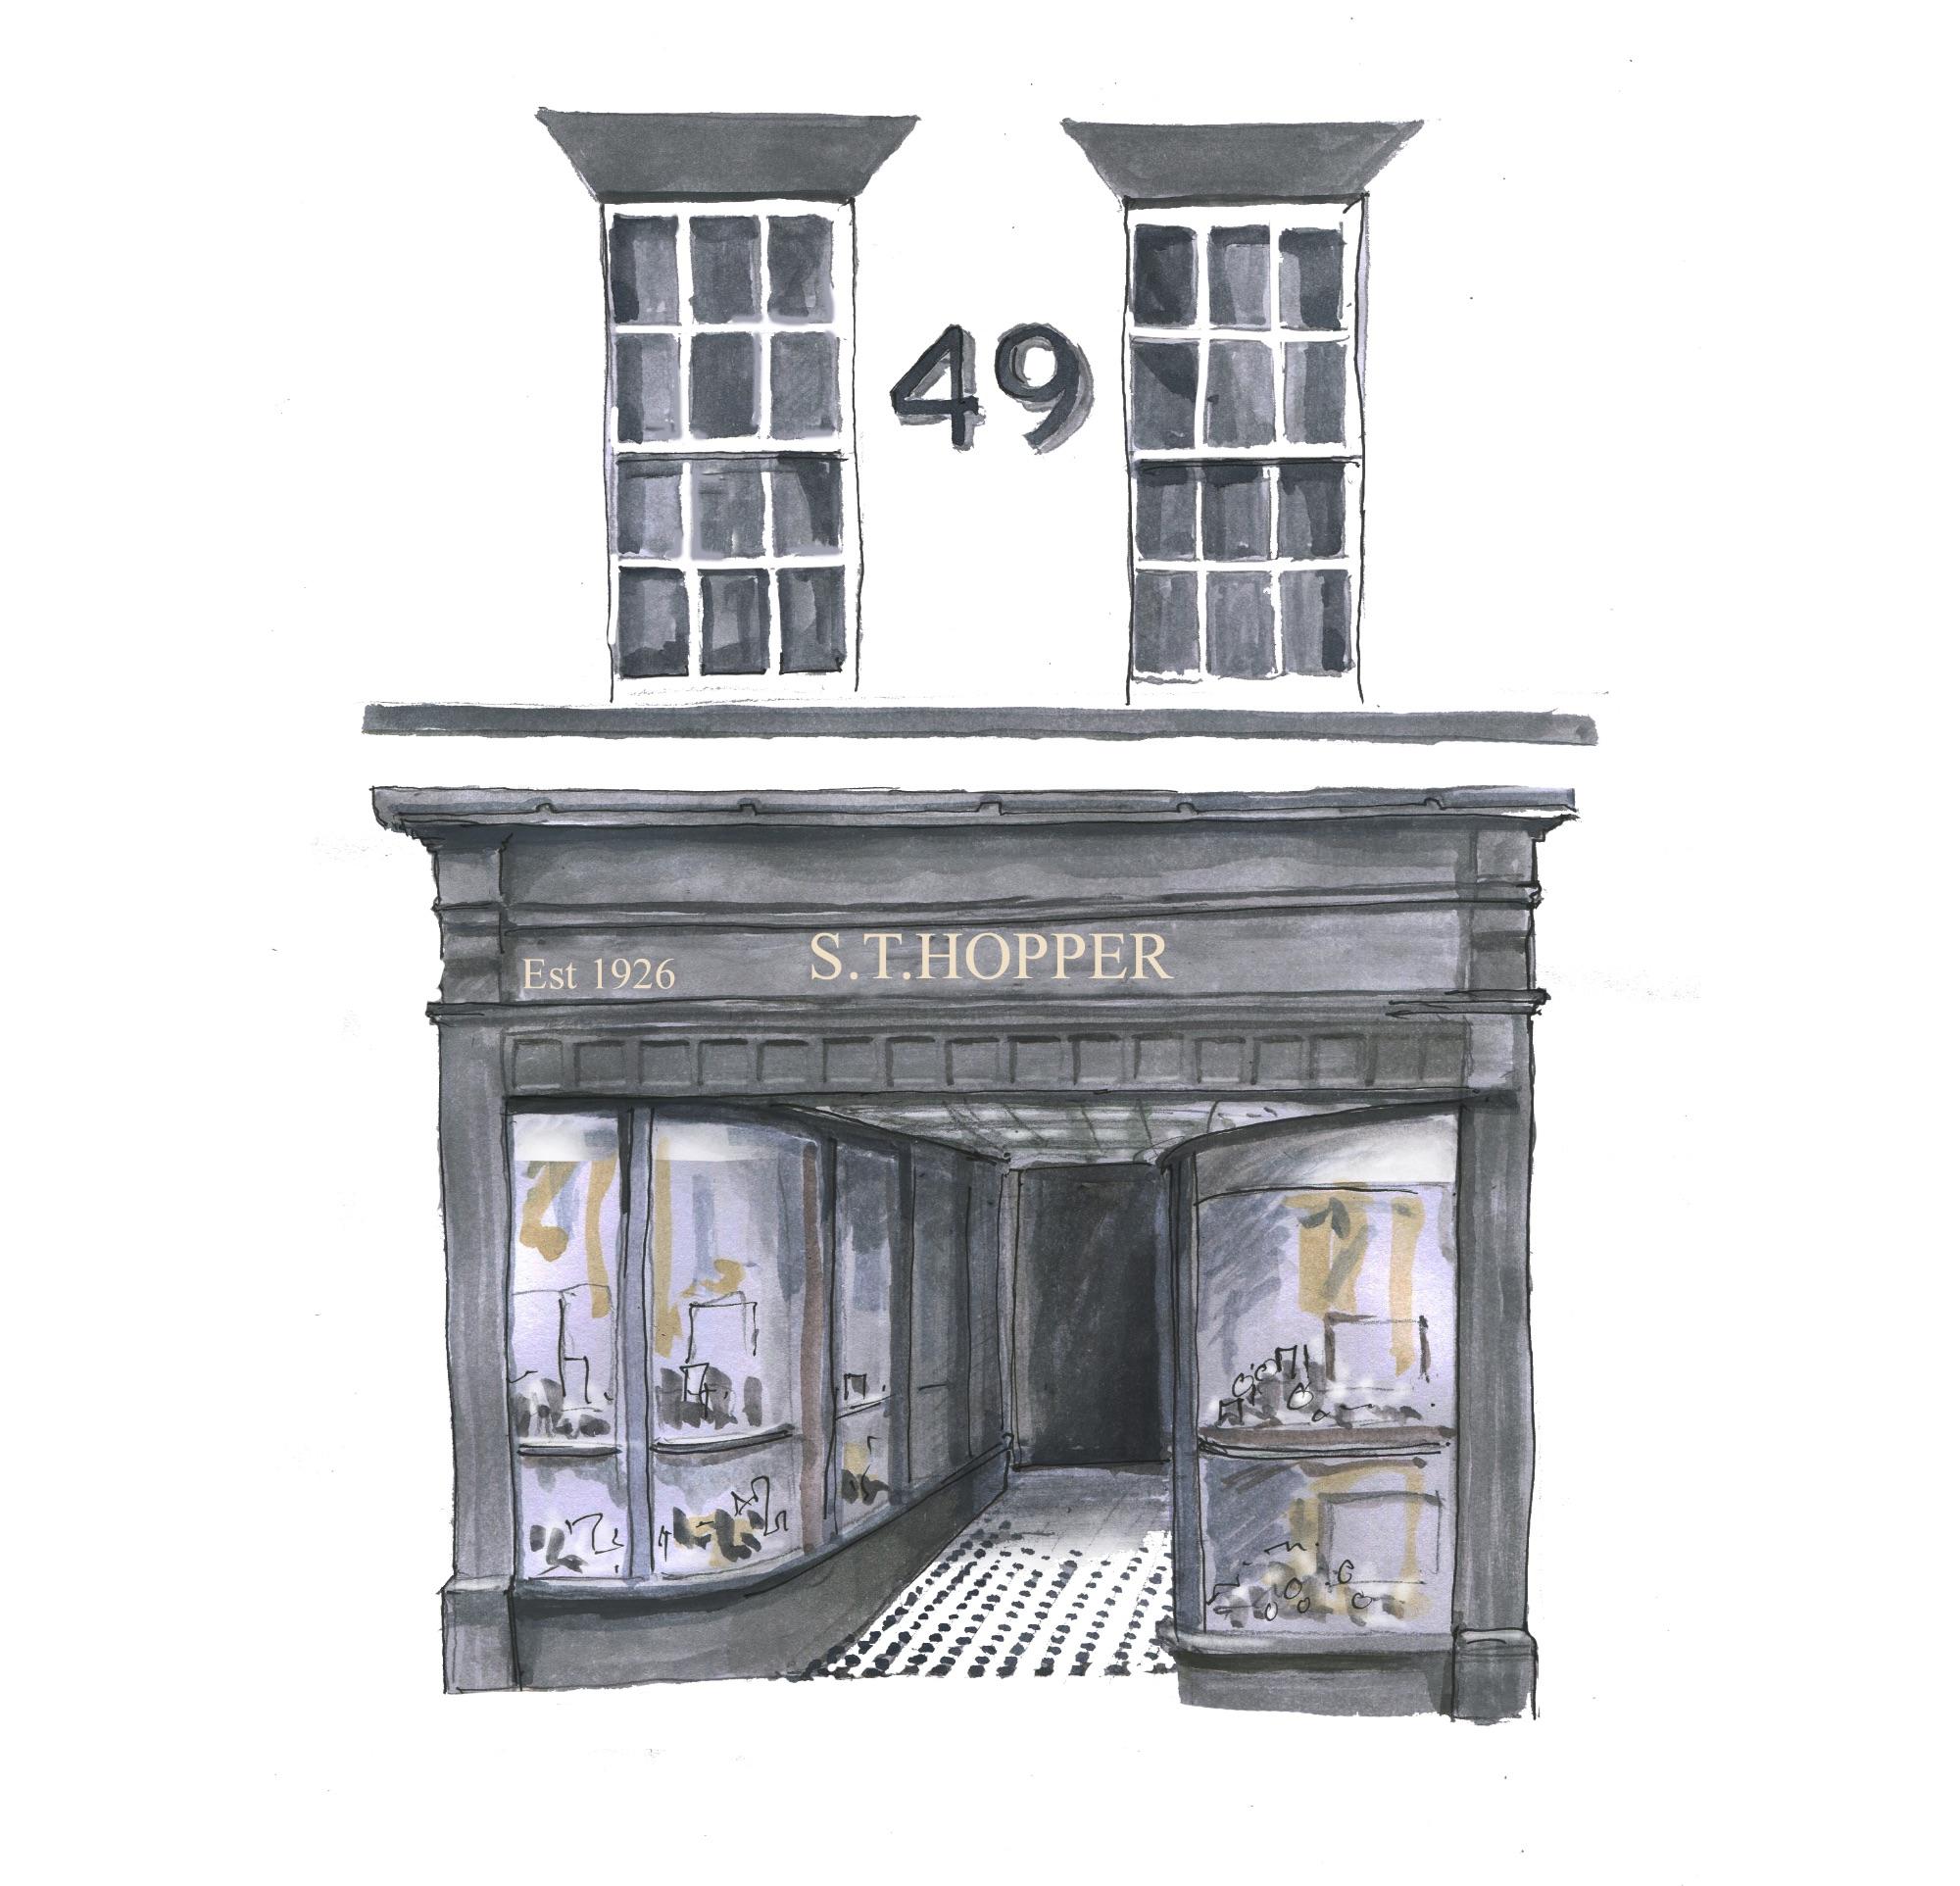 New shop front 1.jpg